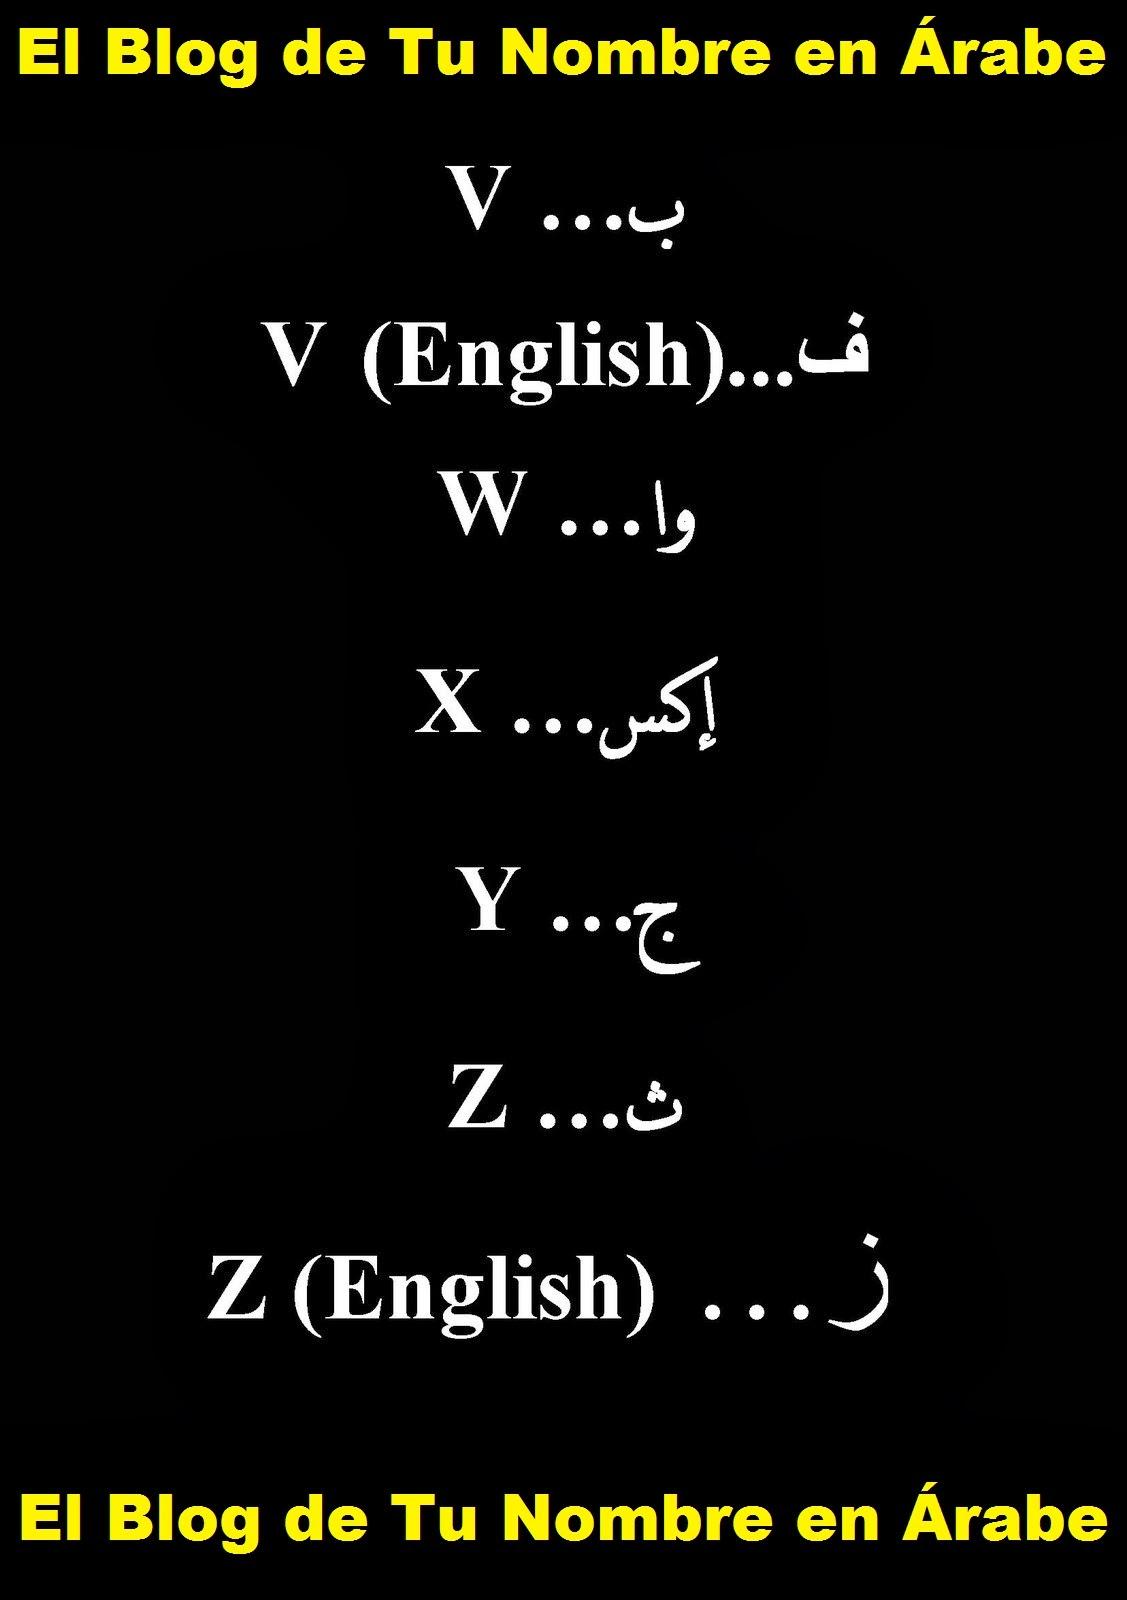 LETRAS ARABES: V W X Y Z